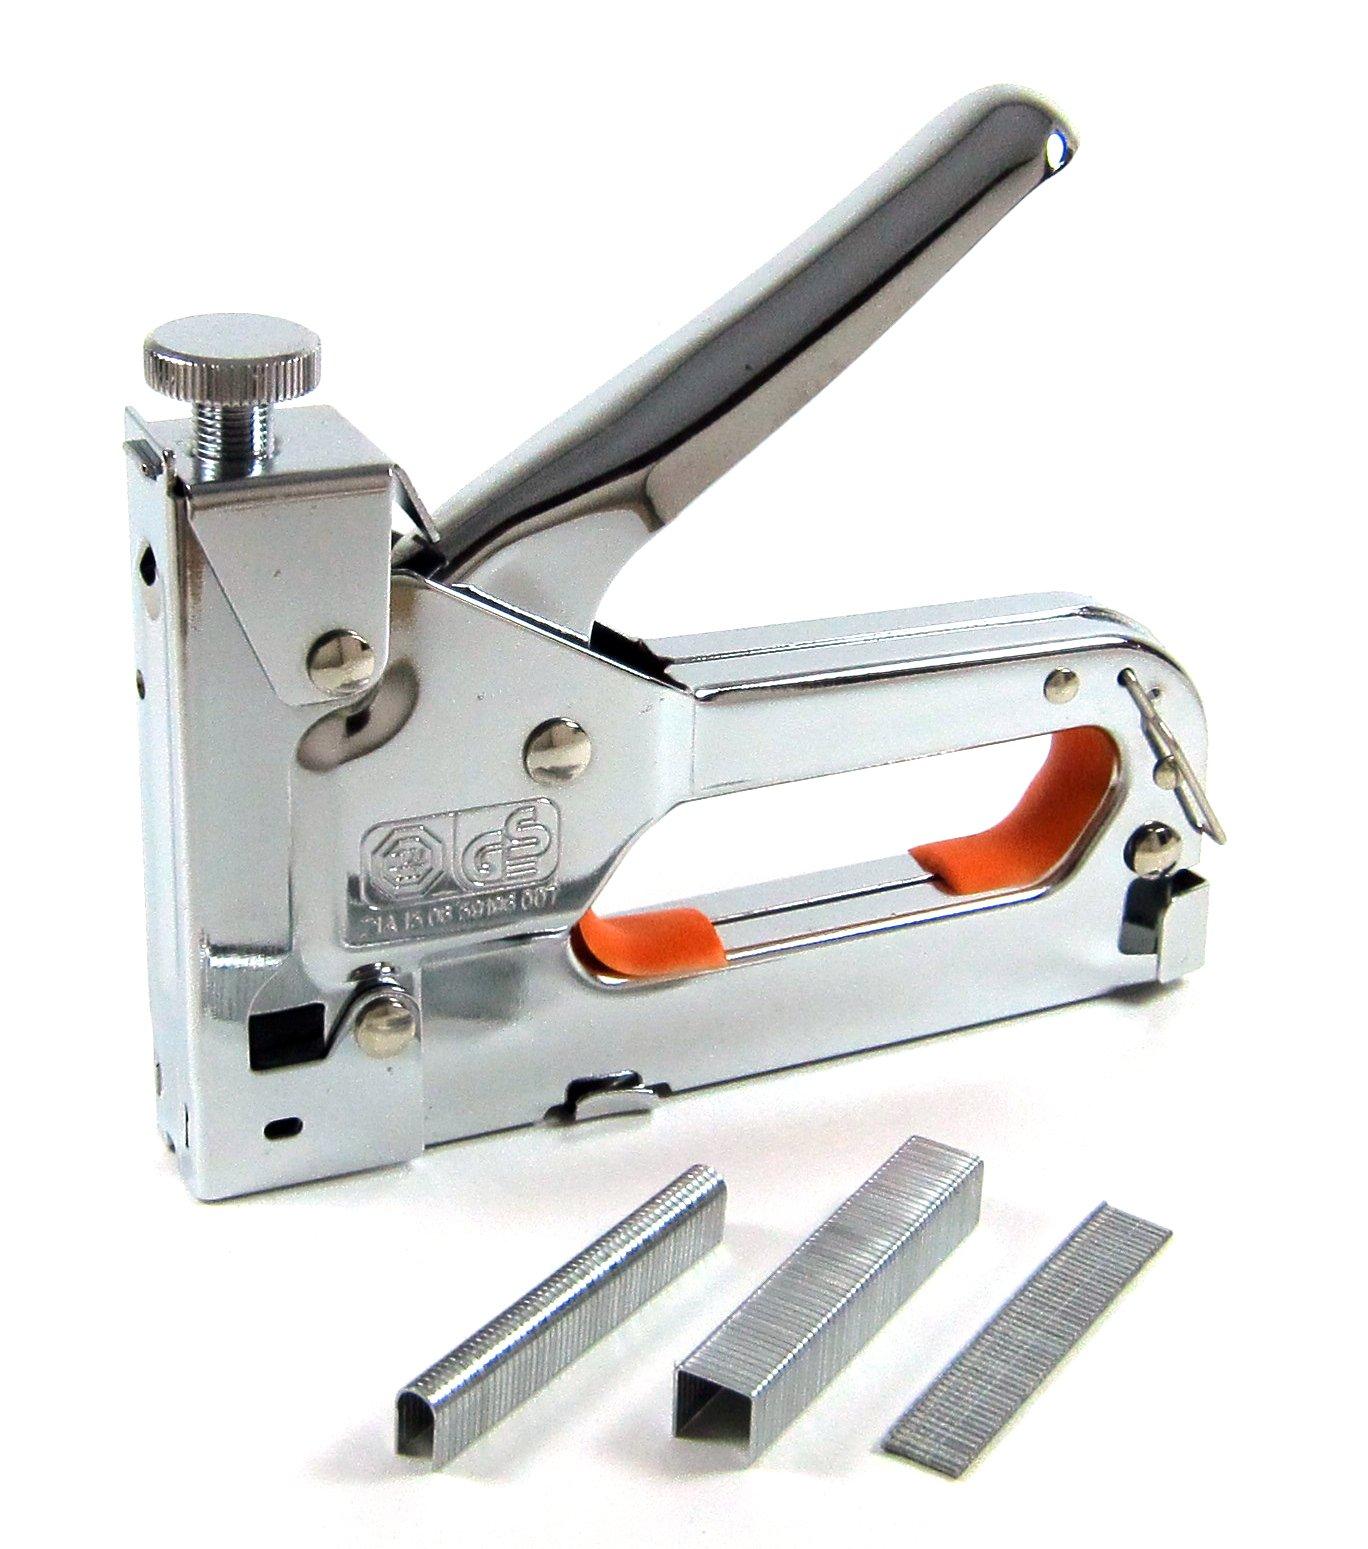 3 Way Staple Gun, Elitexion Three Way Tacker Staple Gun Kit